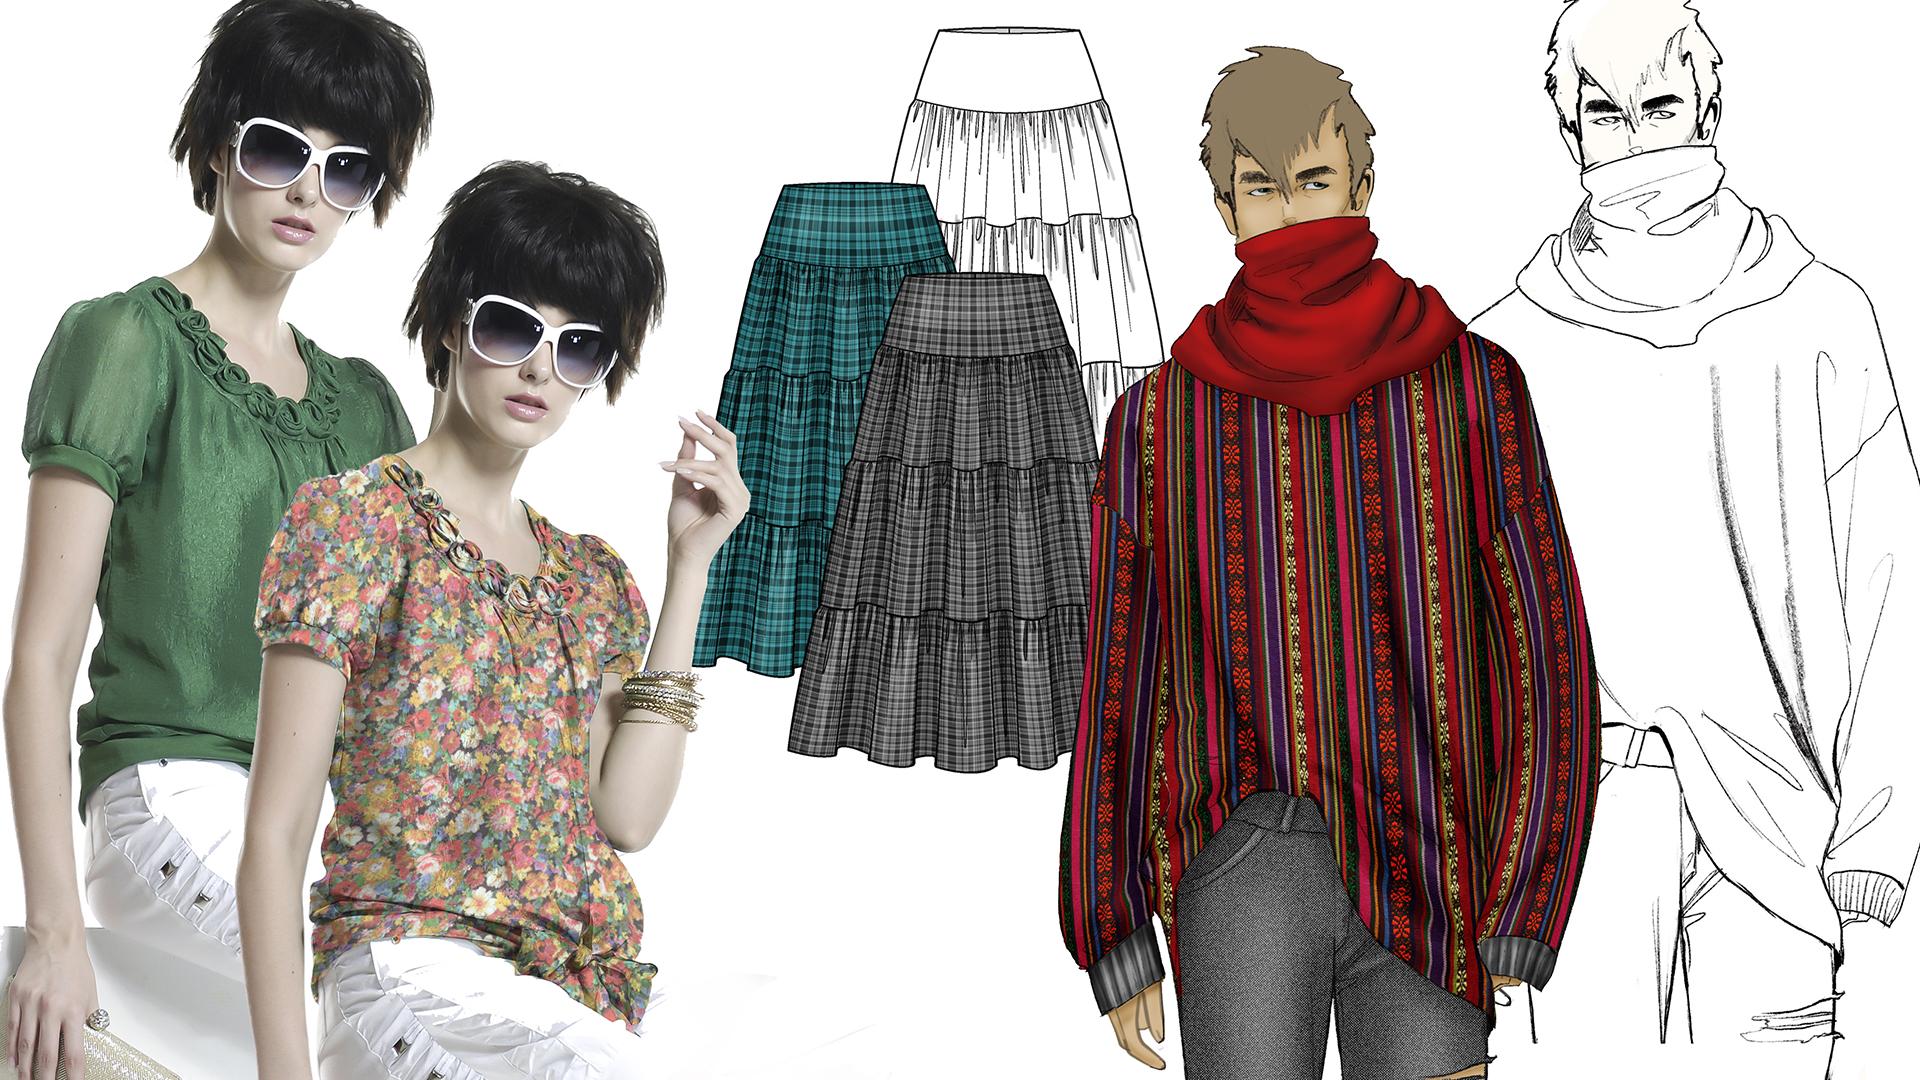 Photoshop For Fashion Warping Pattern Fills Linkedin Learning Formerly Lynda Com